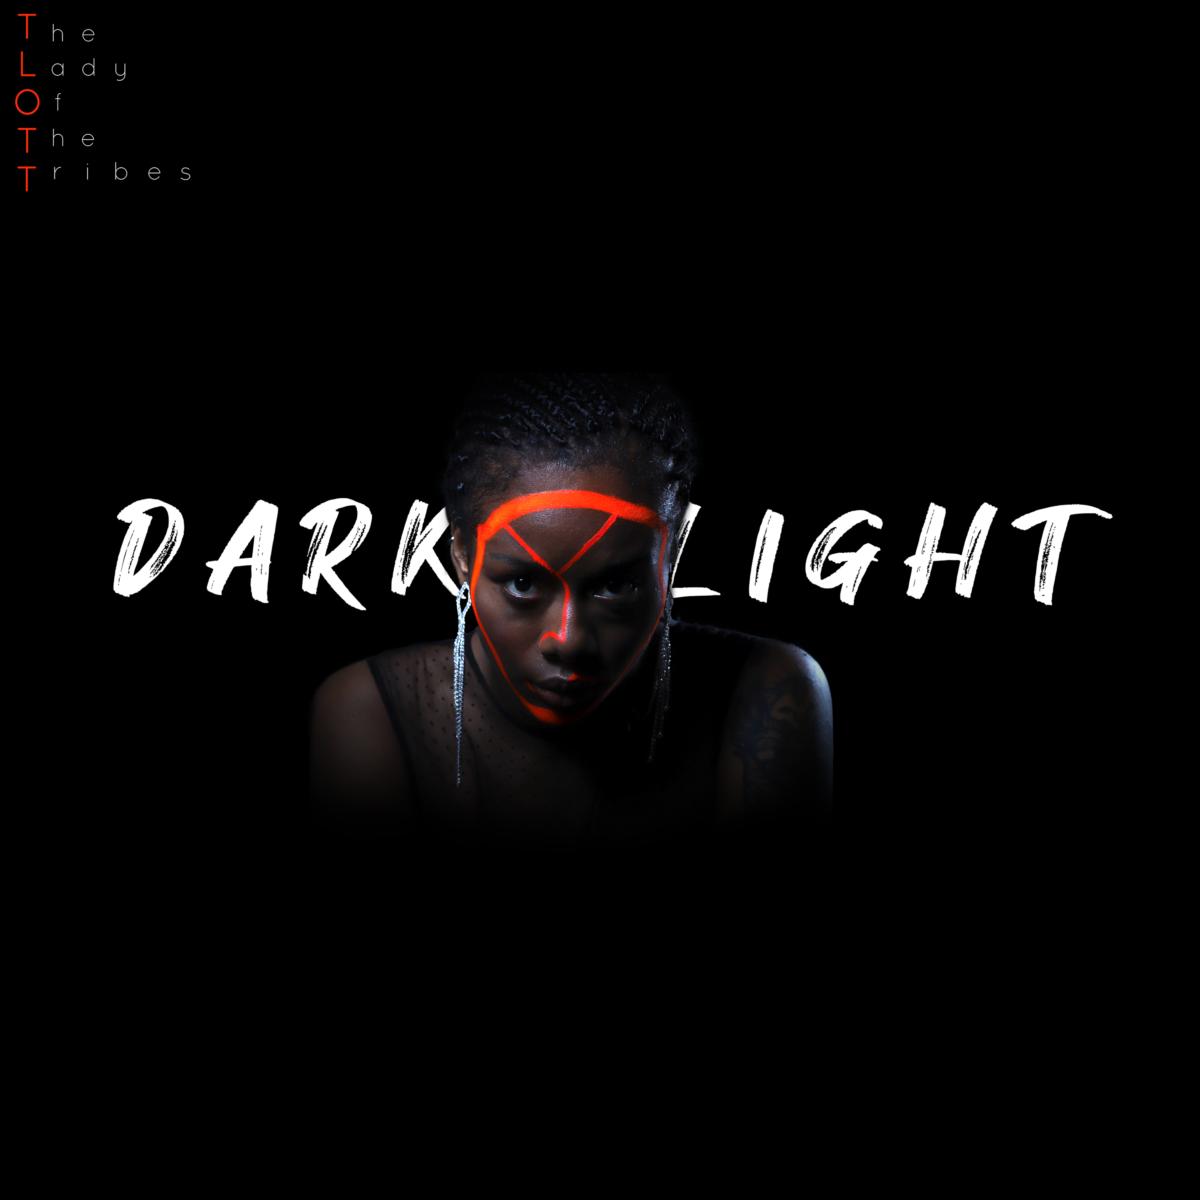 dark lightel nuevo sencillo de the lady of the tribes albumcoverdlresized